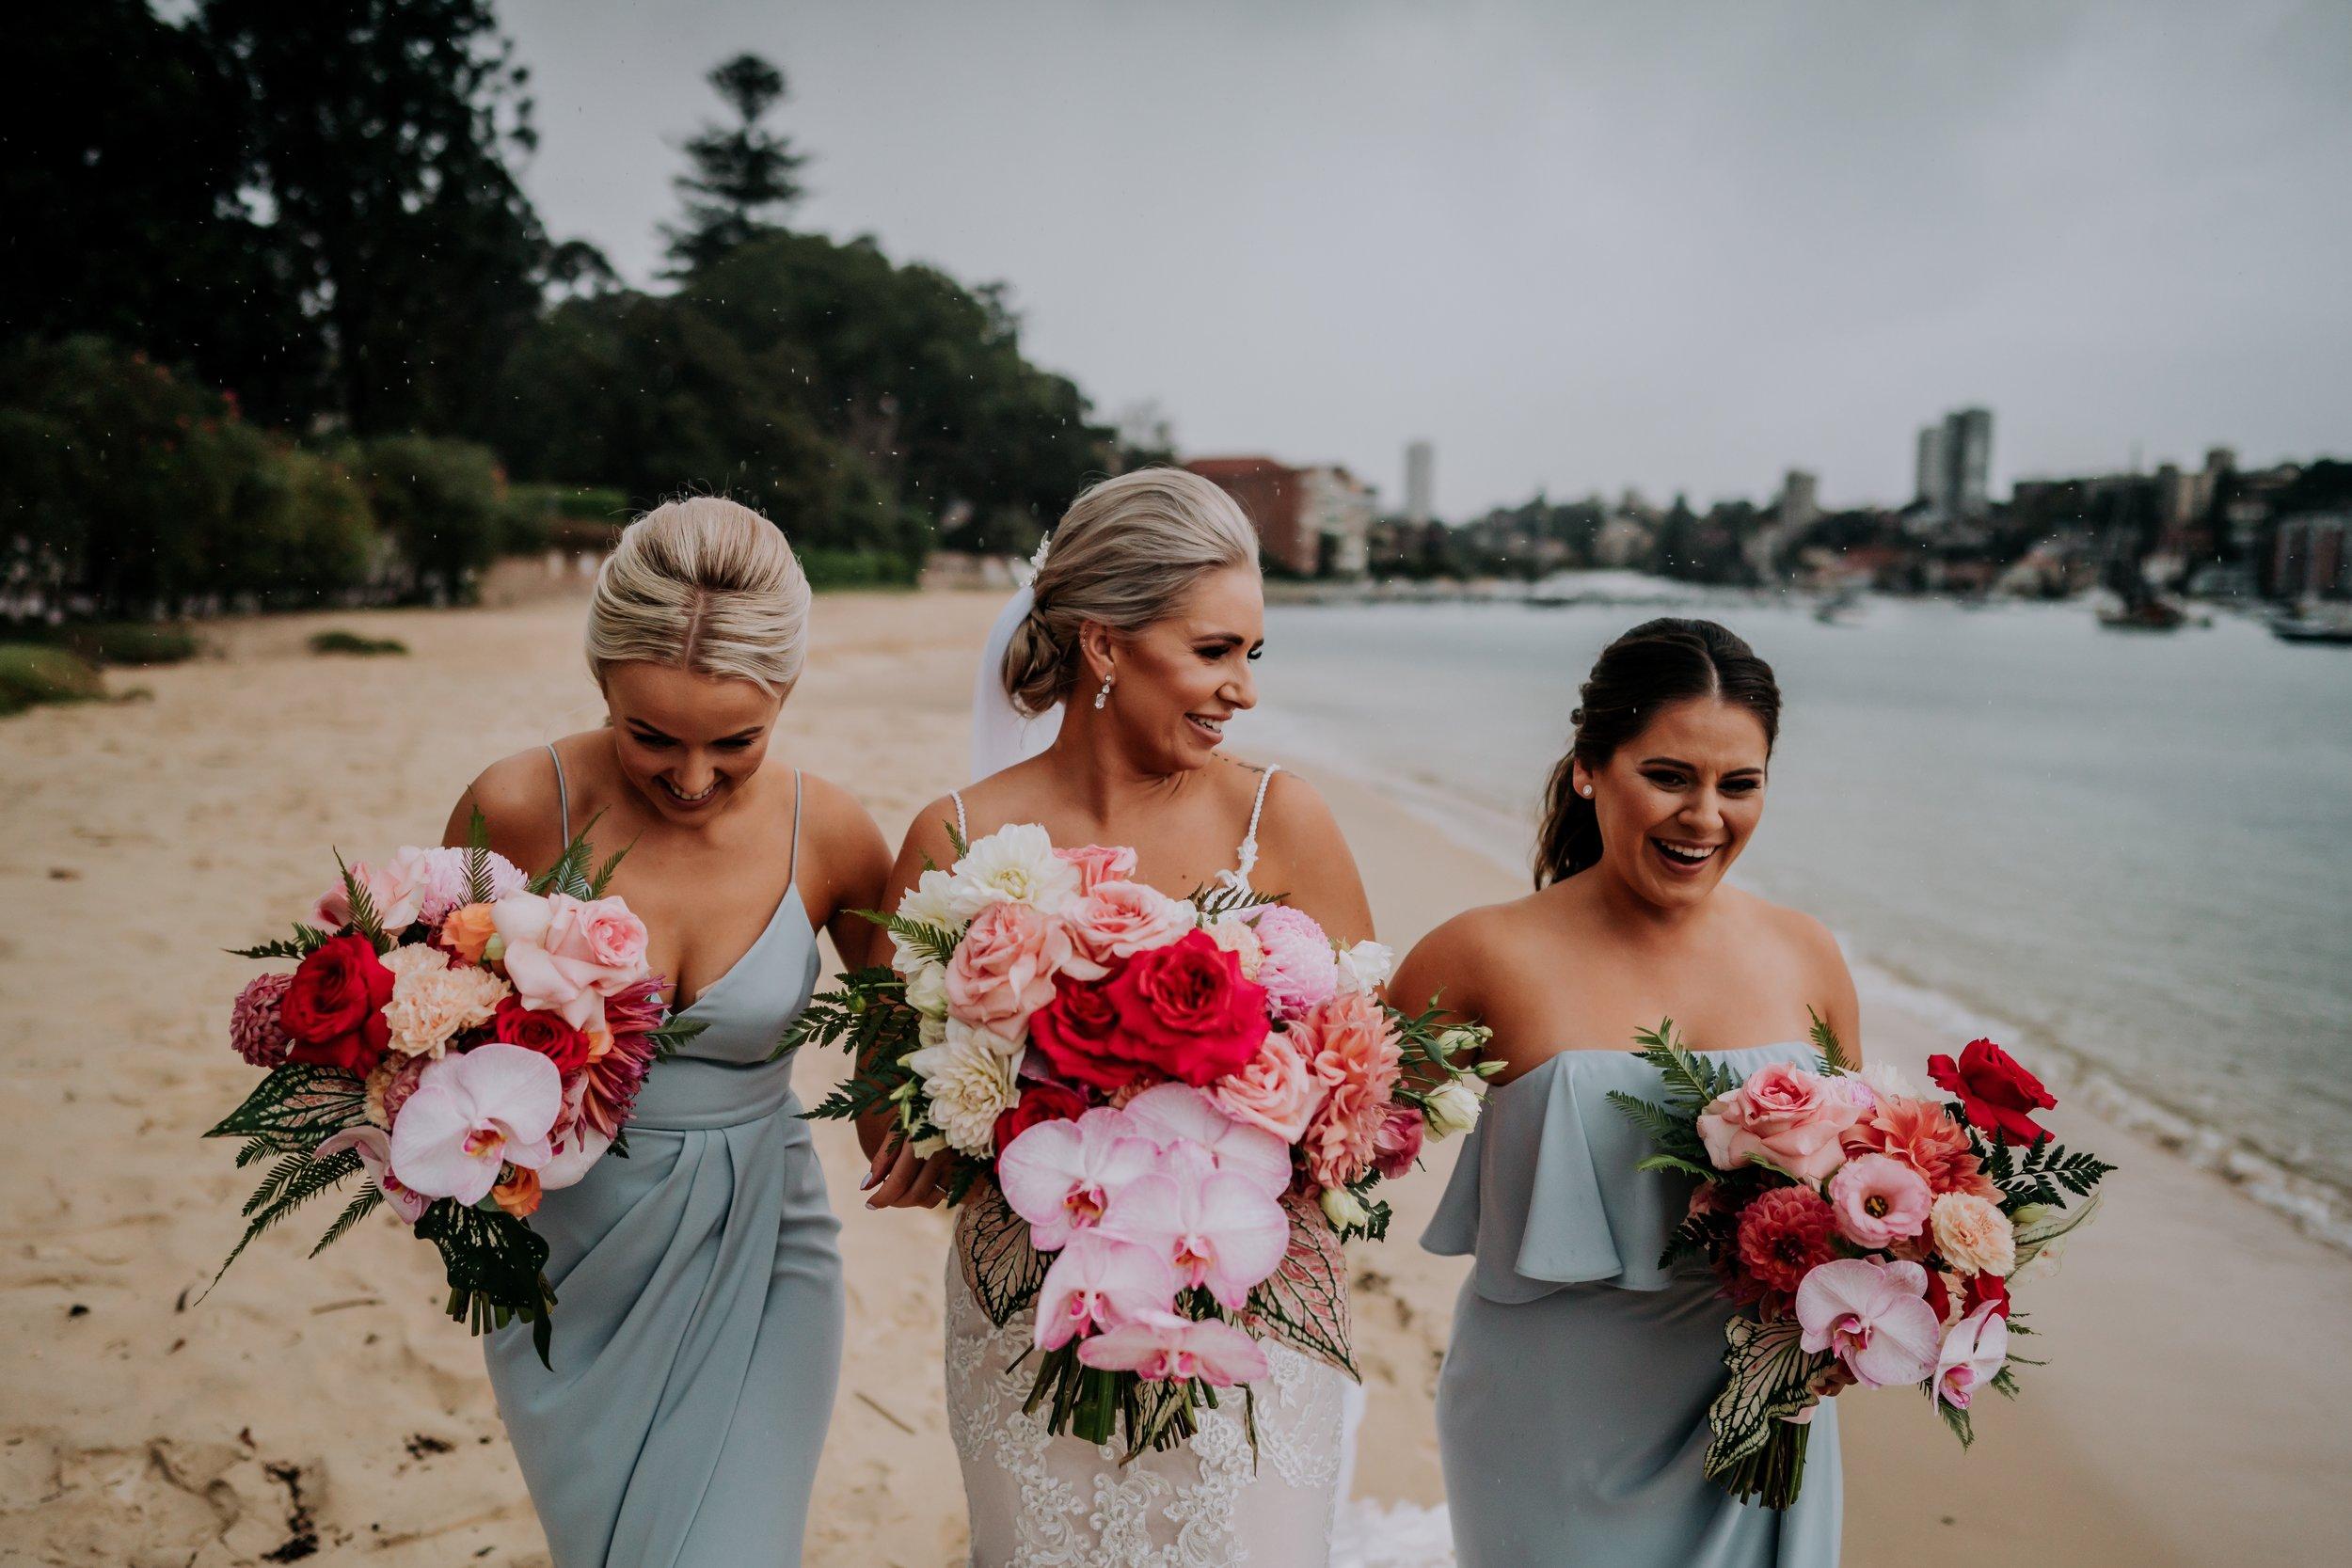 ava-me-photography-gemma-brent-zest-point-piper-sydney-wedding-420.jpg